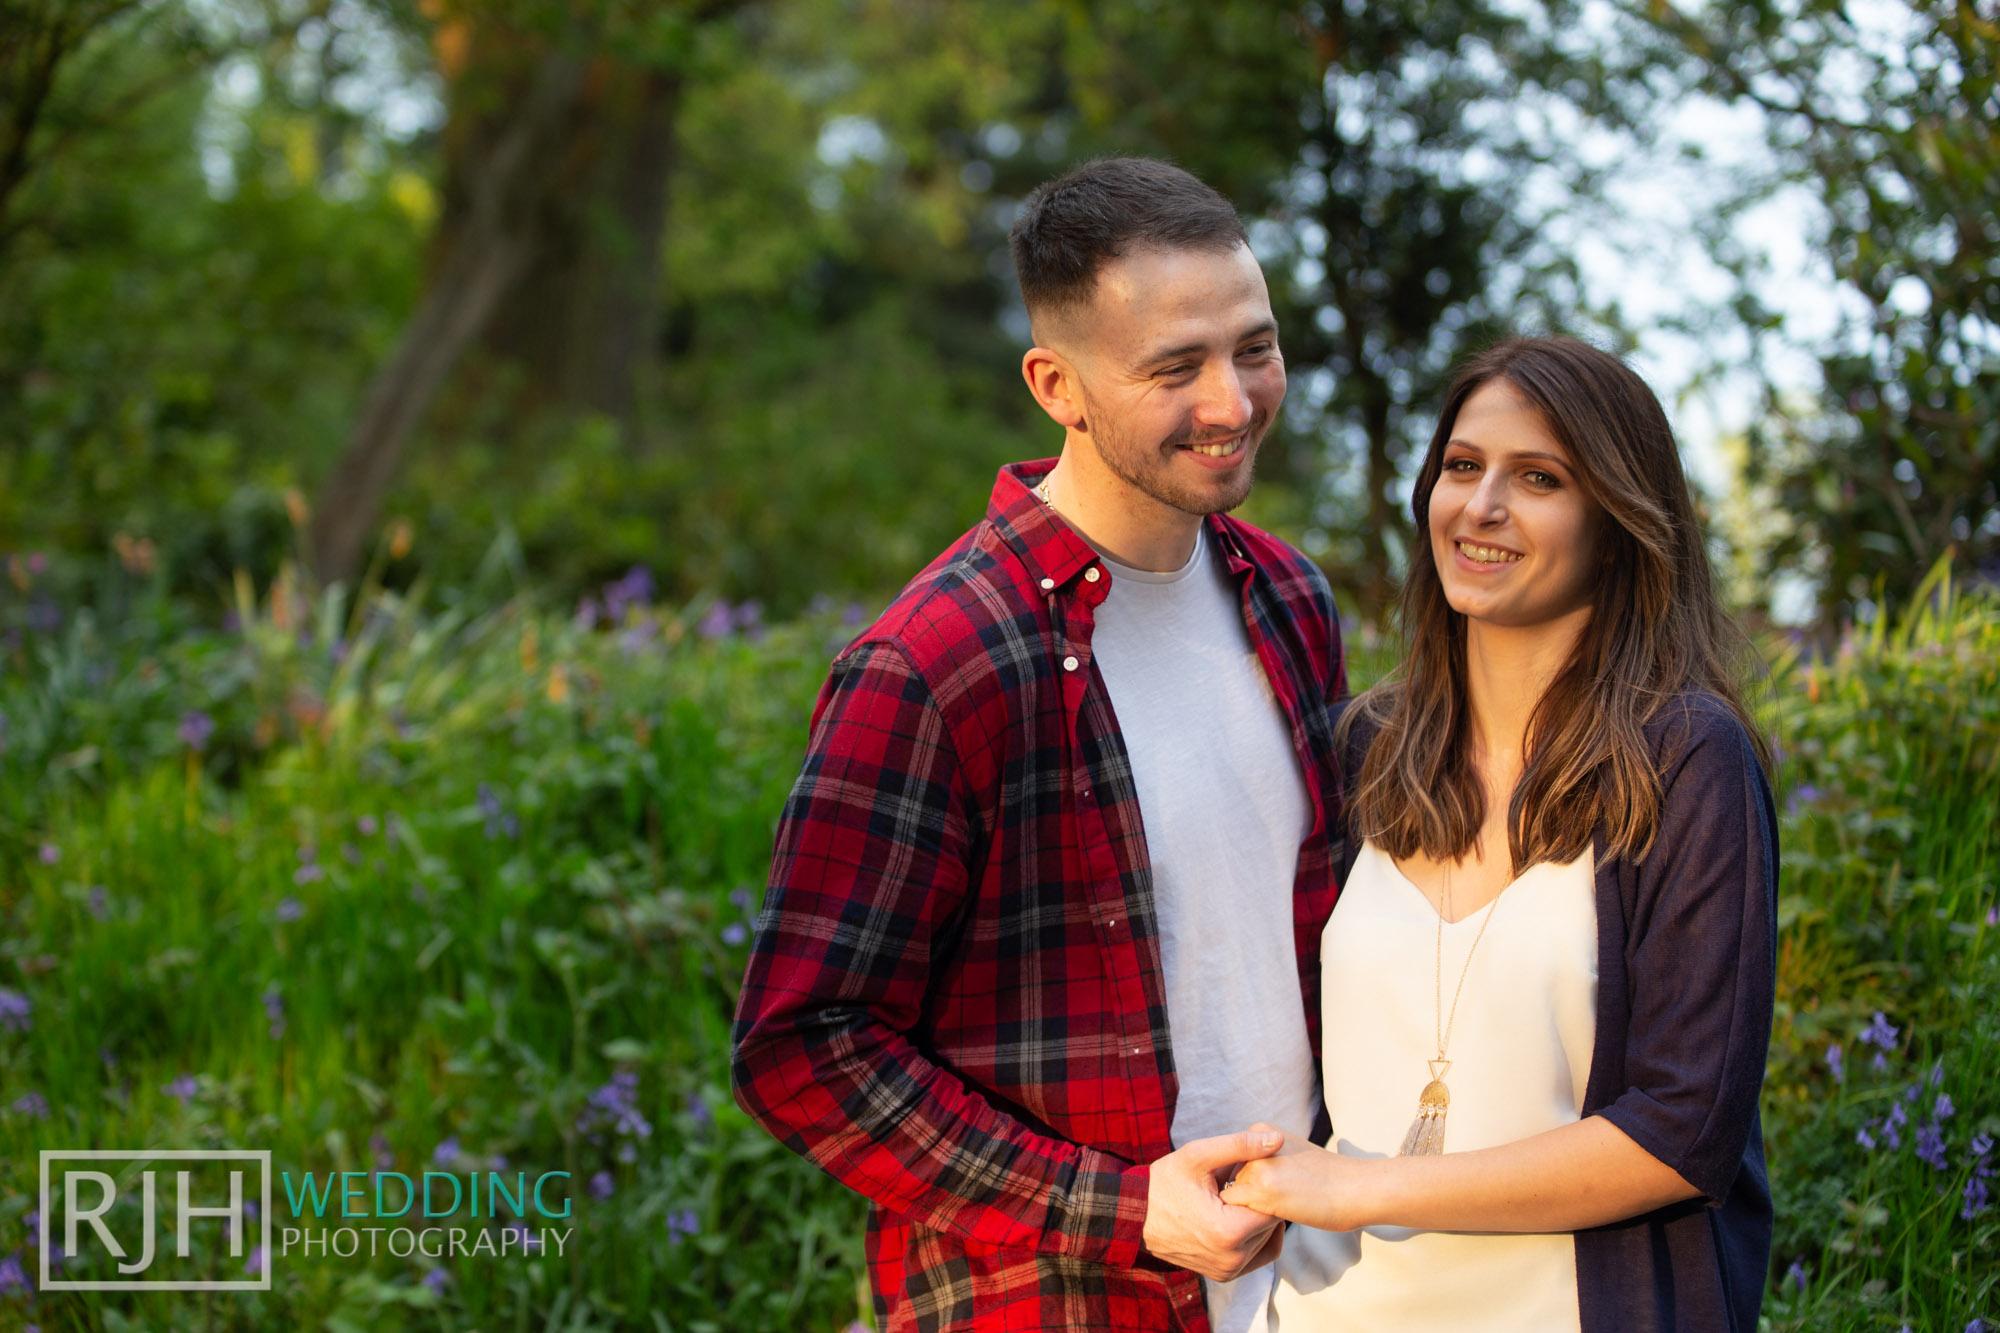 Pre-wedding photography_Abbie & Reece_Graves Park_004_IMG_1176.jpg